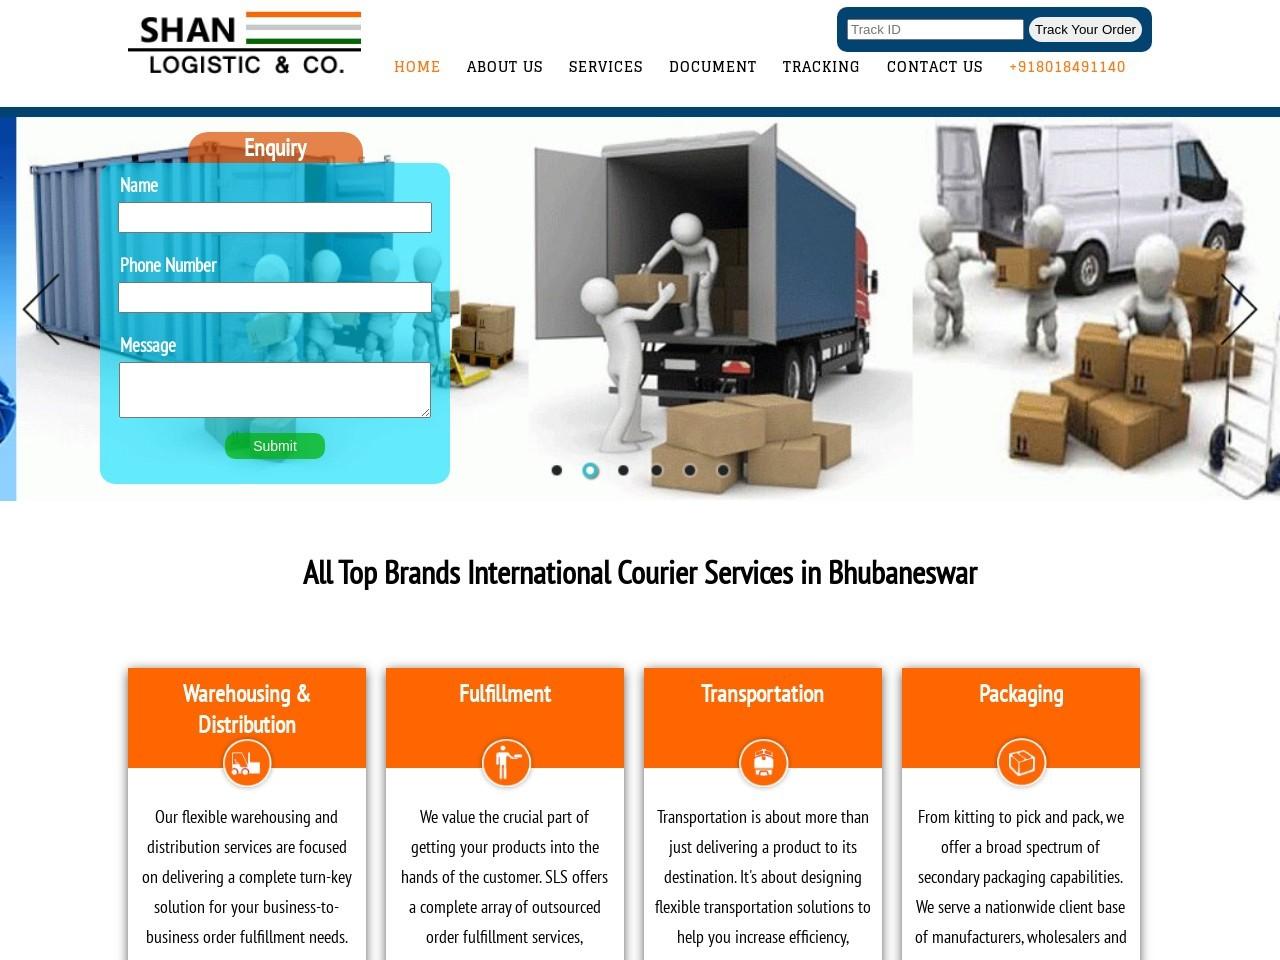 Top Brand International Courier Service in Bhubaneswar